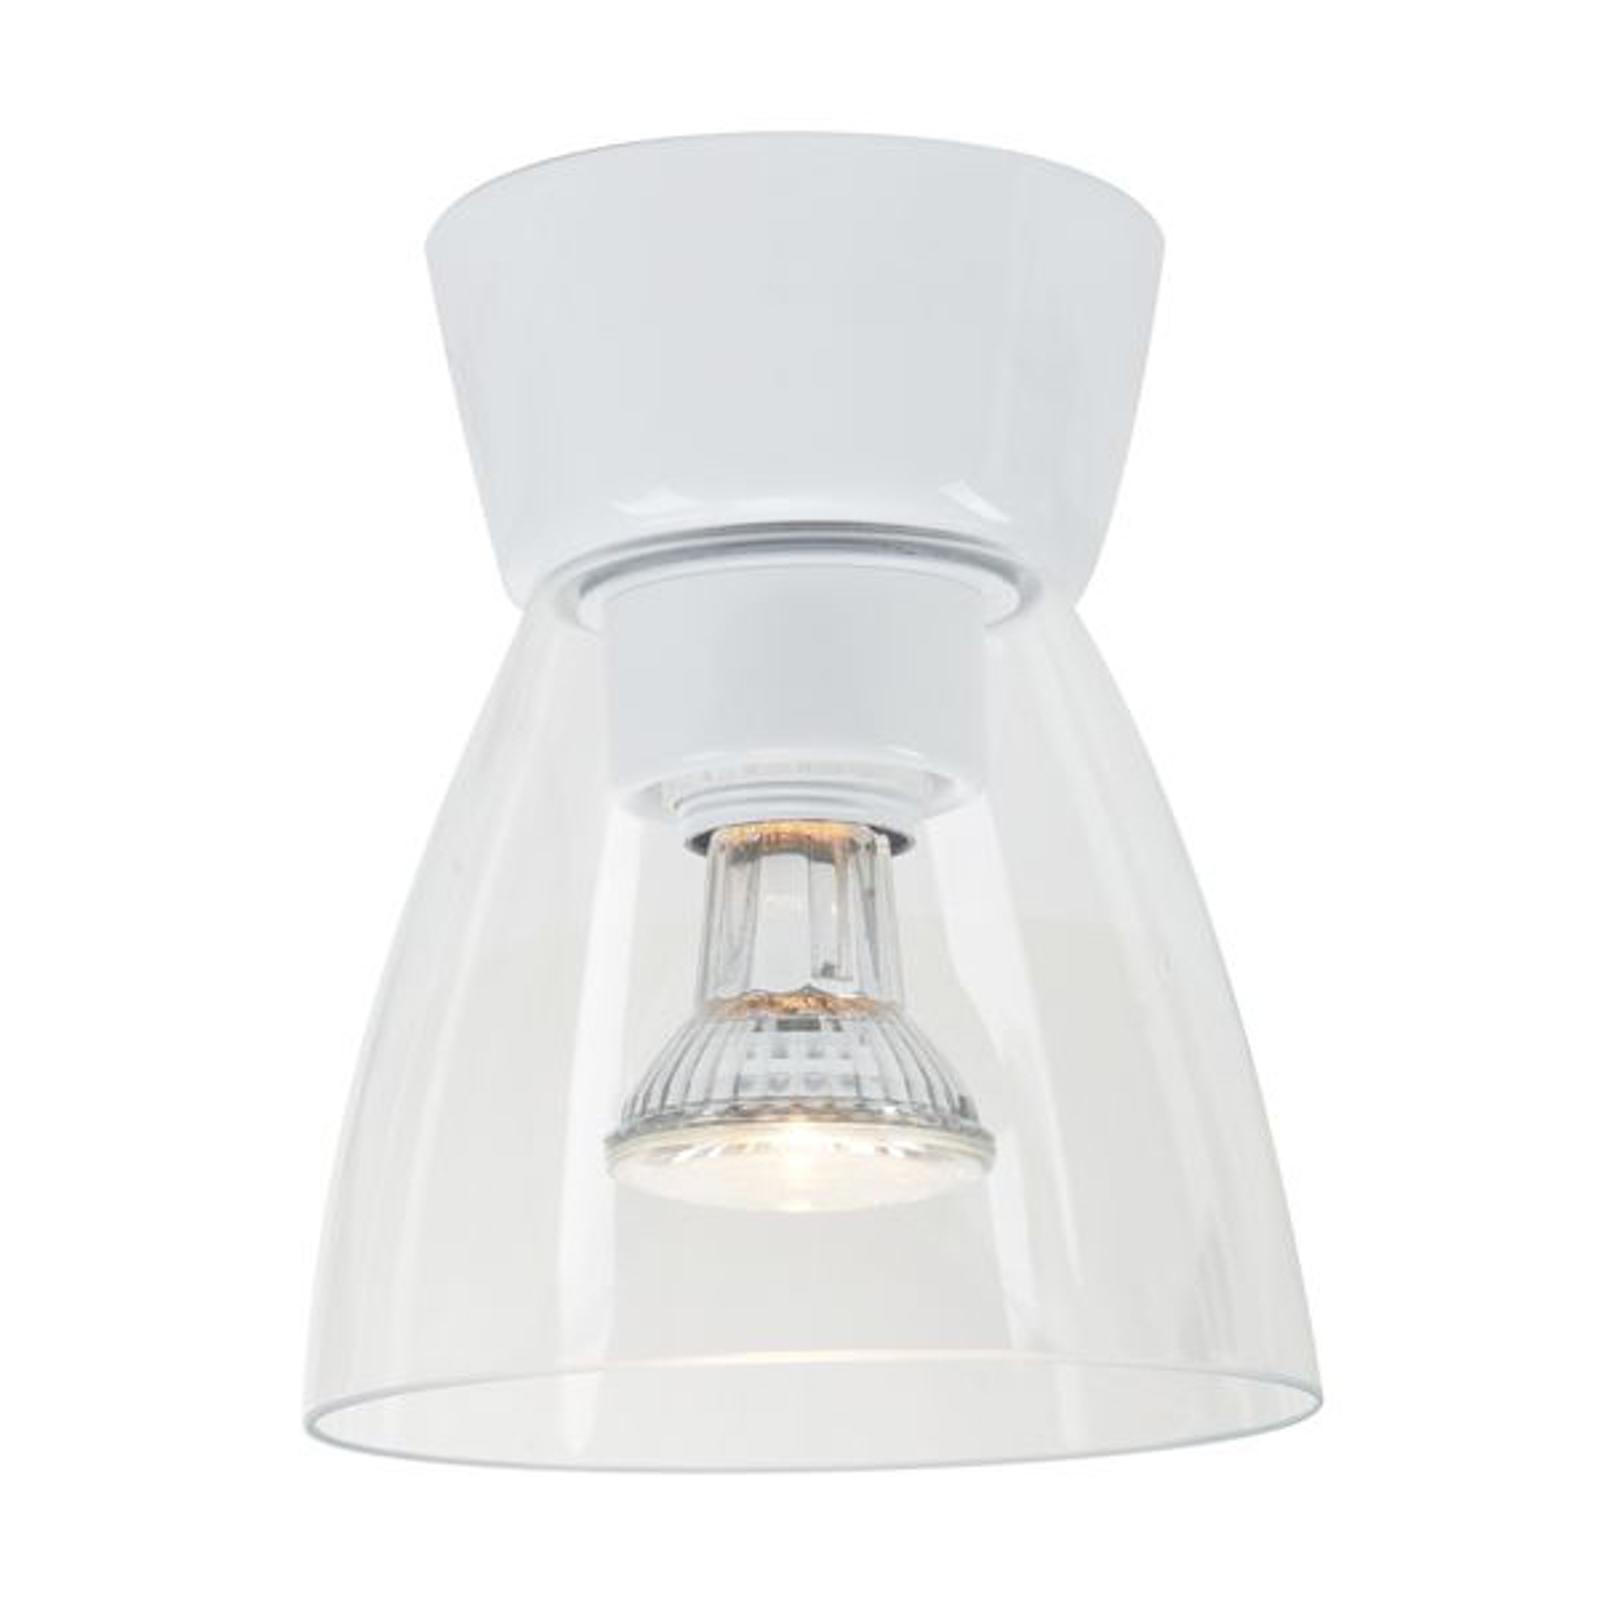 LED-taklampe Bizzo baldakin hvit, klart glass